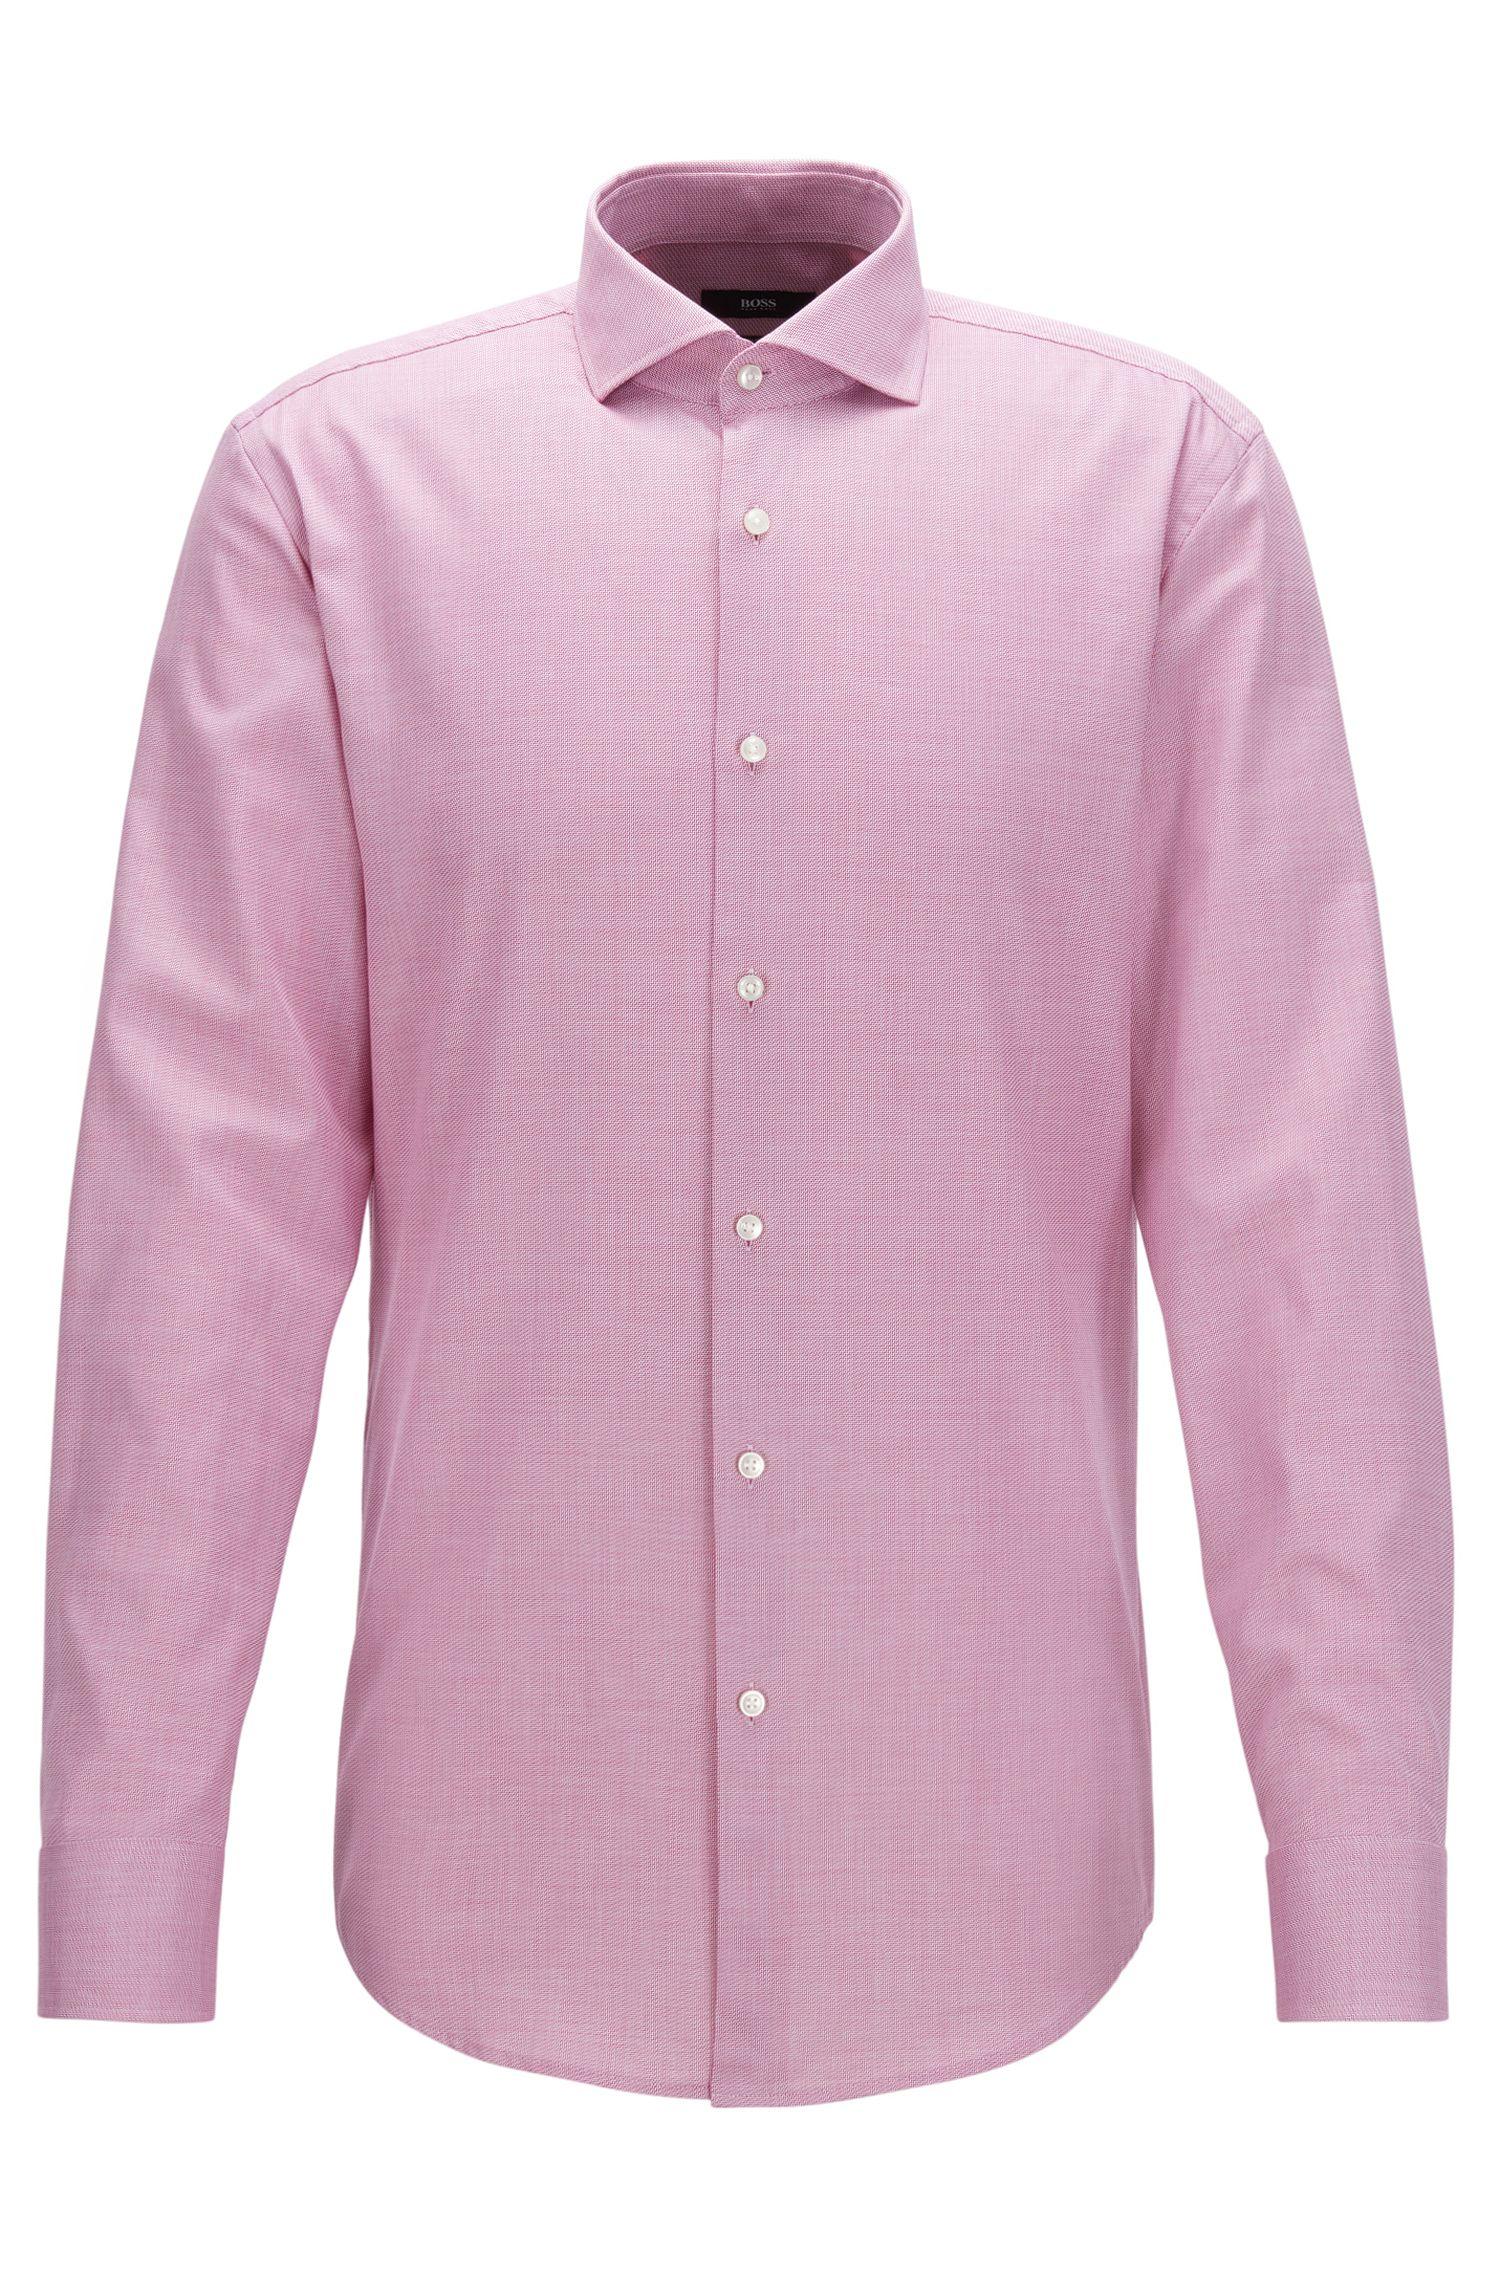 Cotton Dress Shirt, Slim Fit | Jason, Dark pink